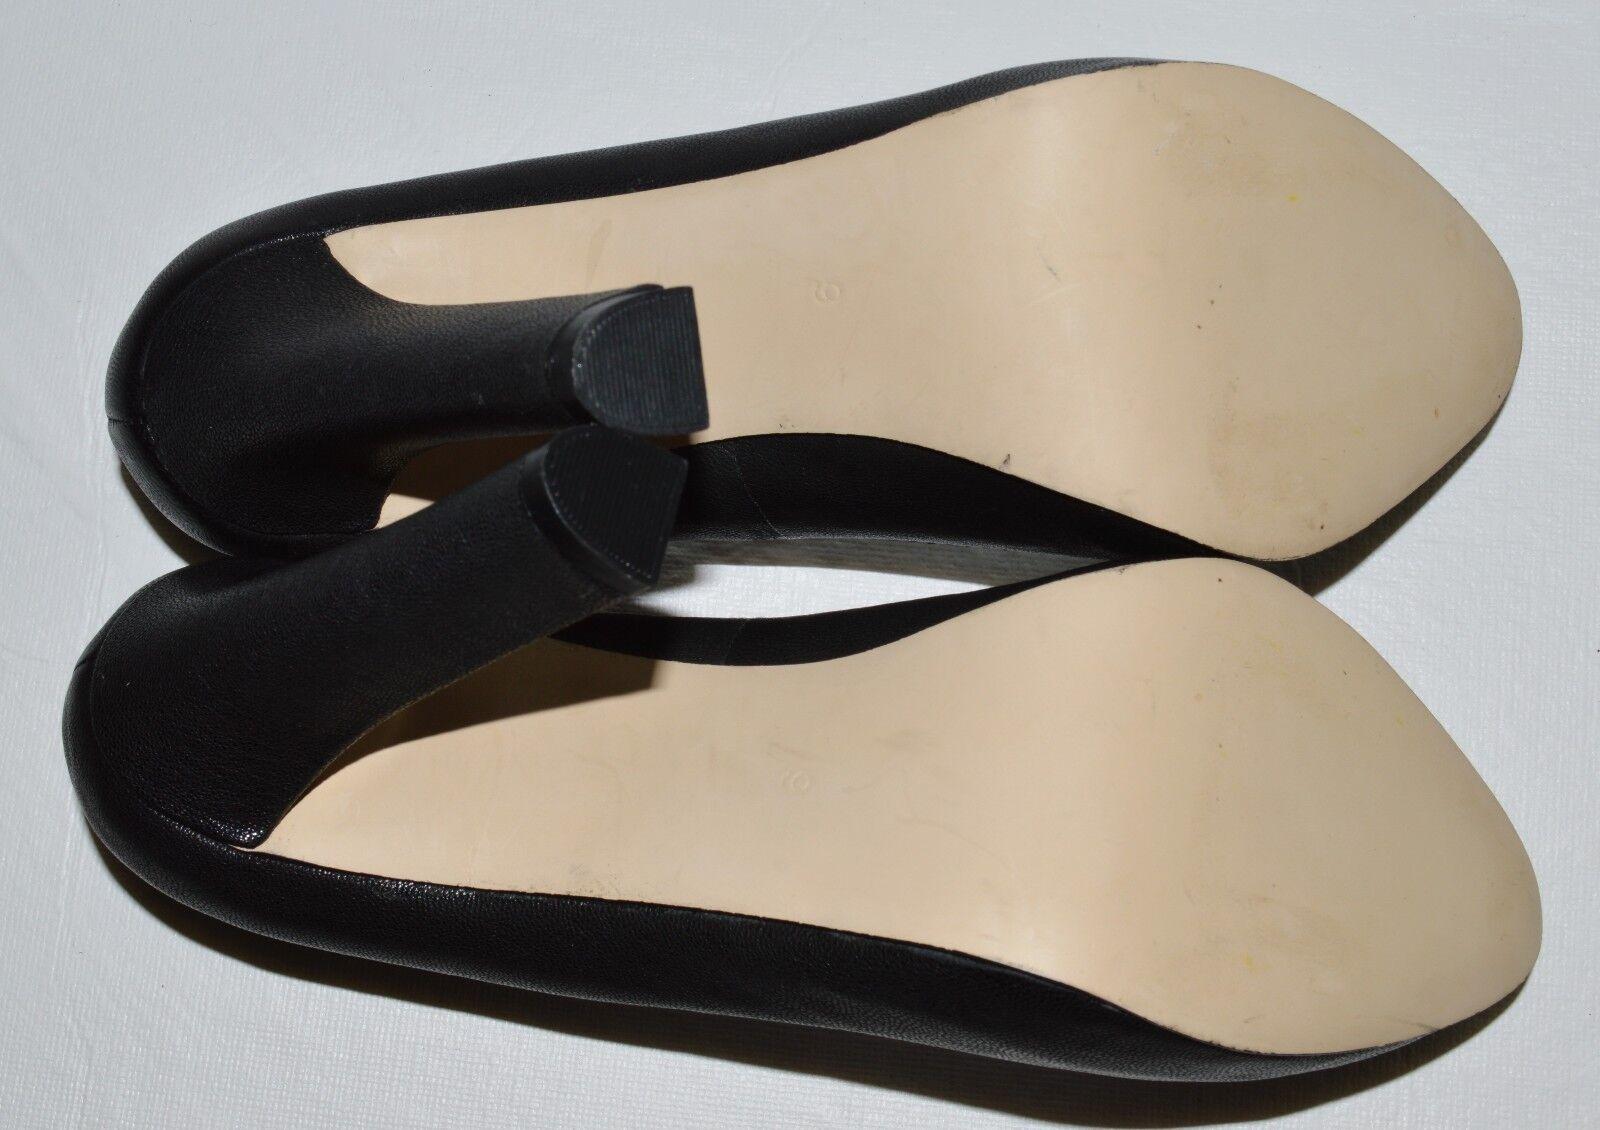 DV DOLCE VITA NEW SZ 9  BLACK LEATHER PLATFORM PUMPS  9 heels schuhe 02564d